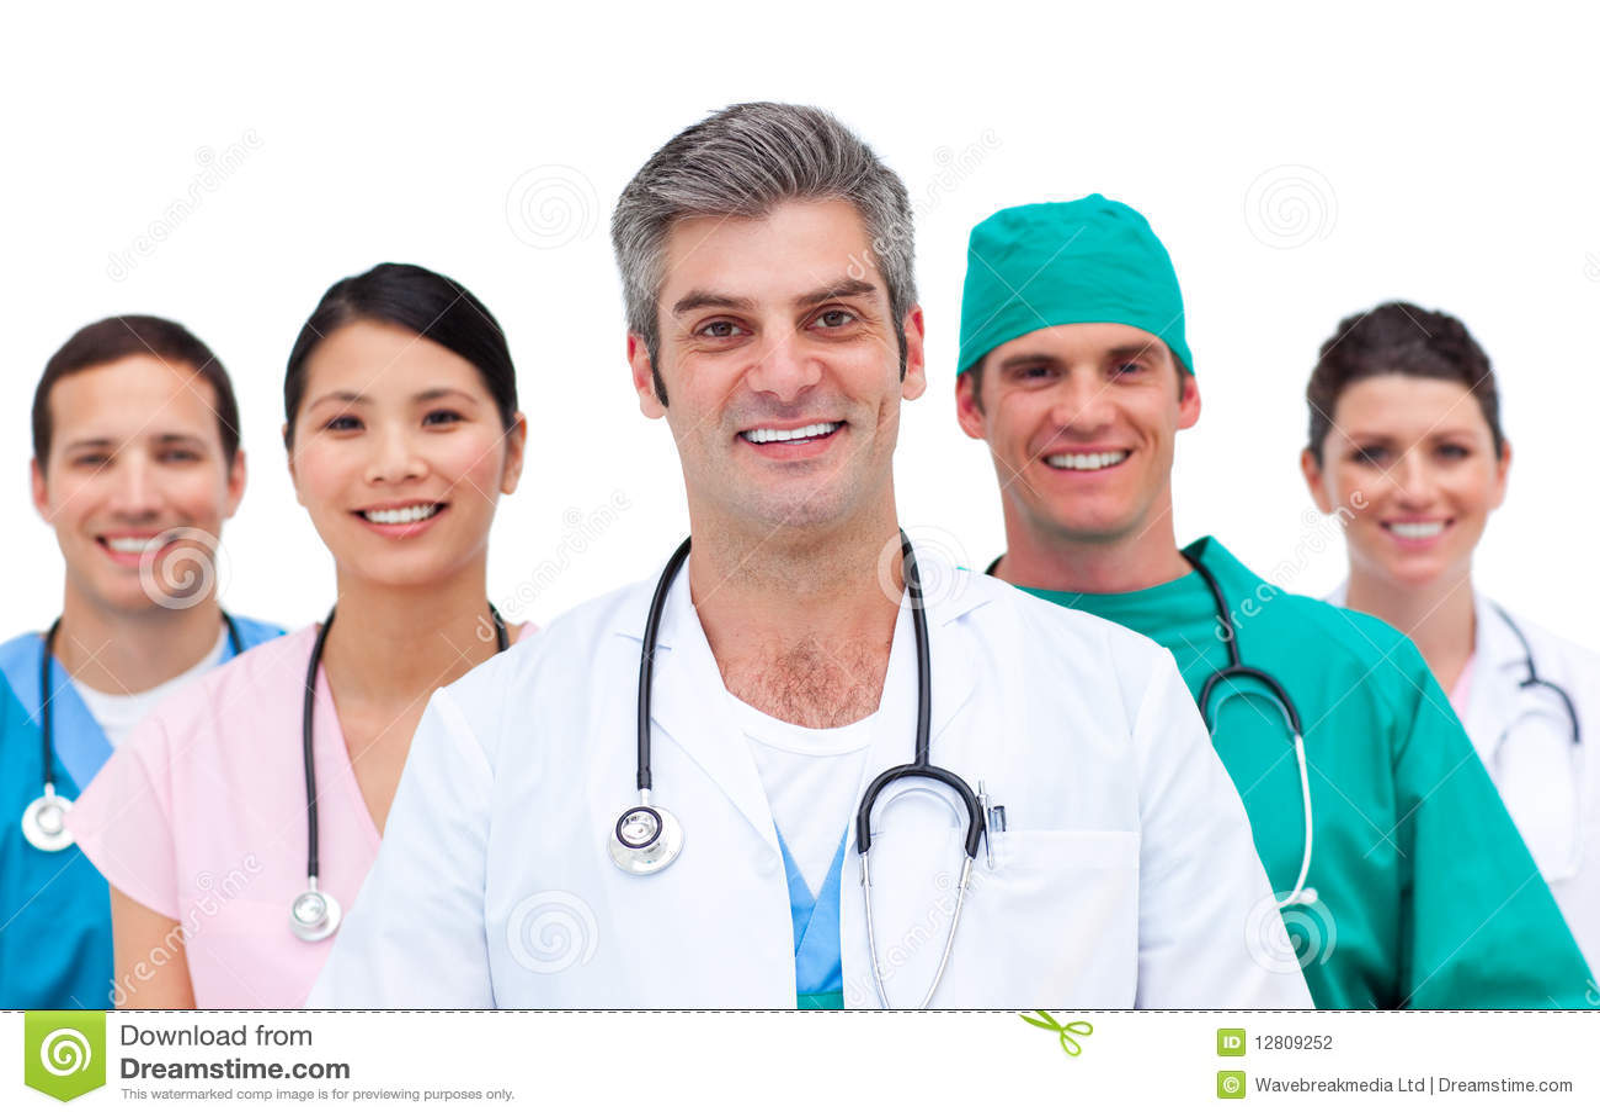 Close-up of a medical team